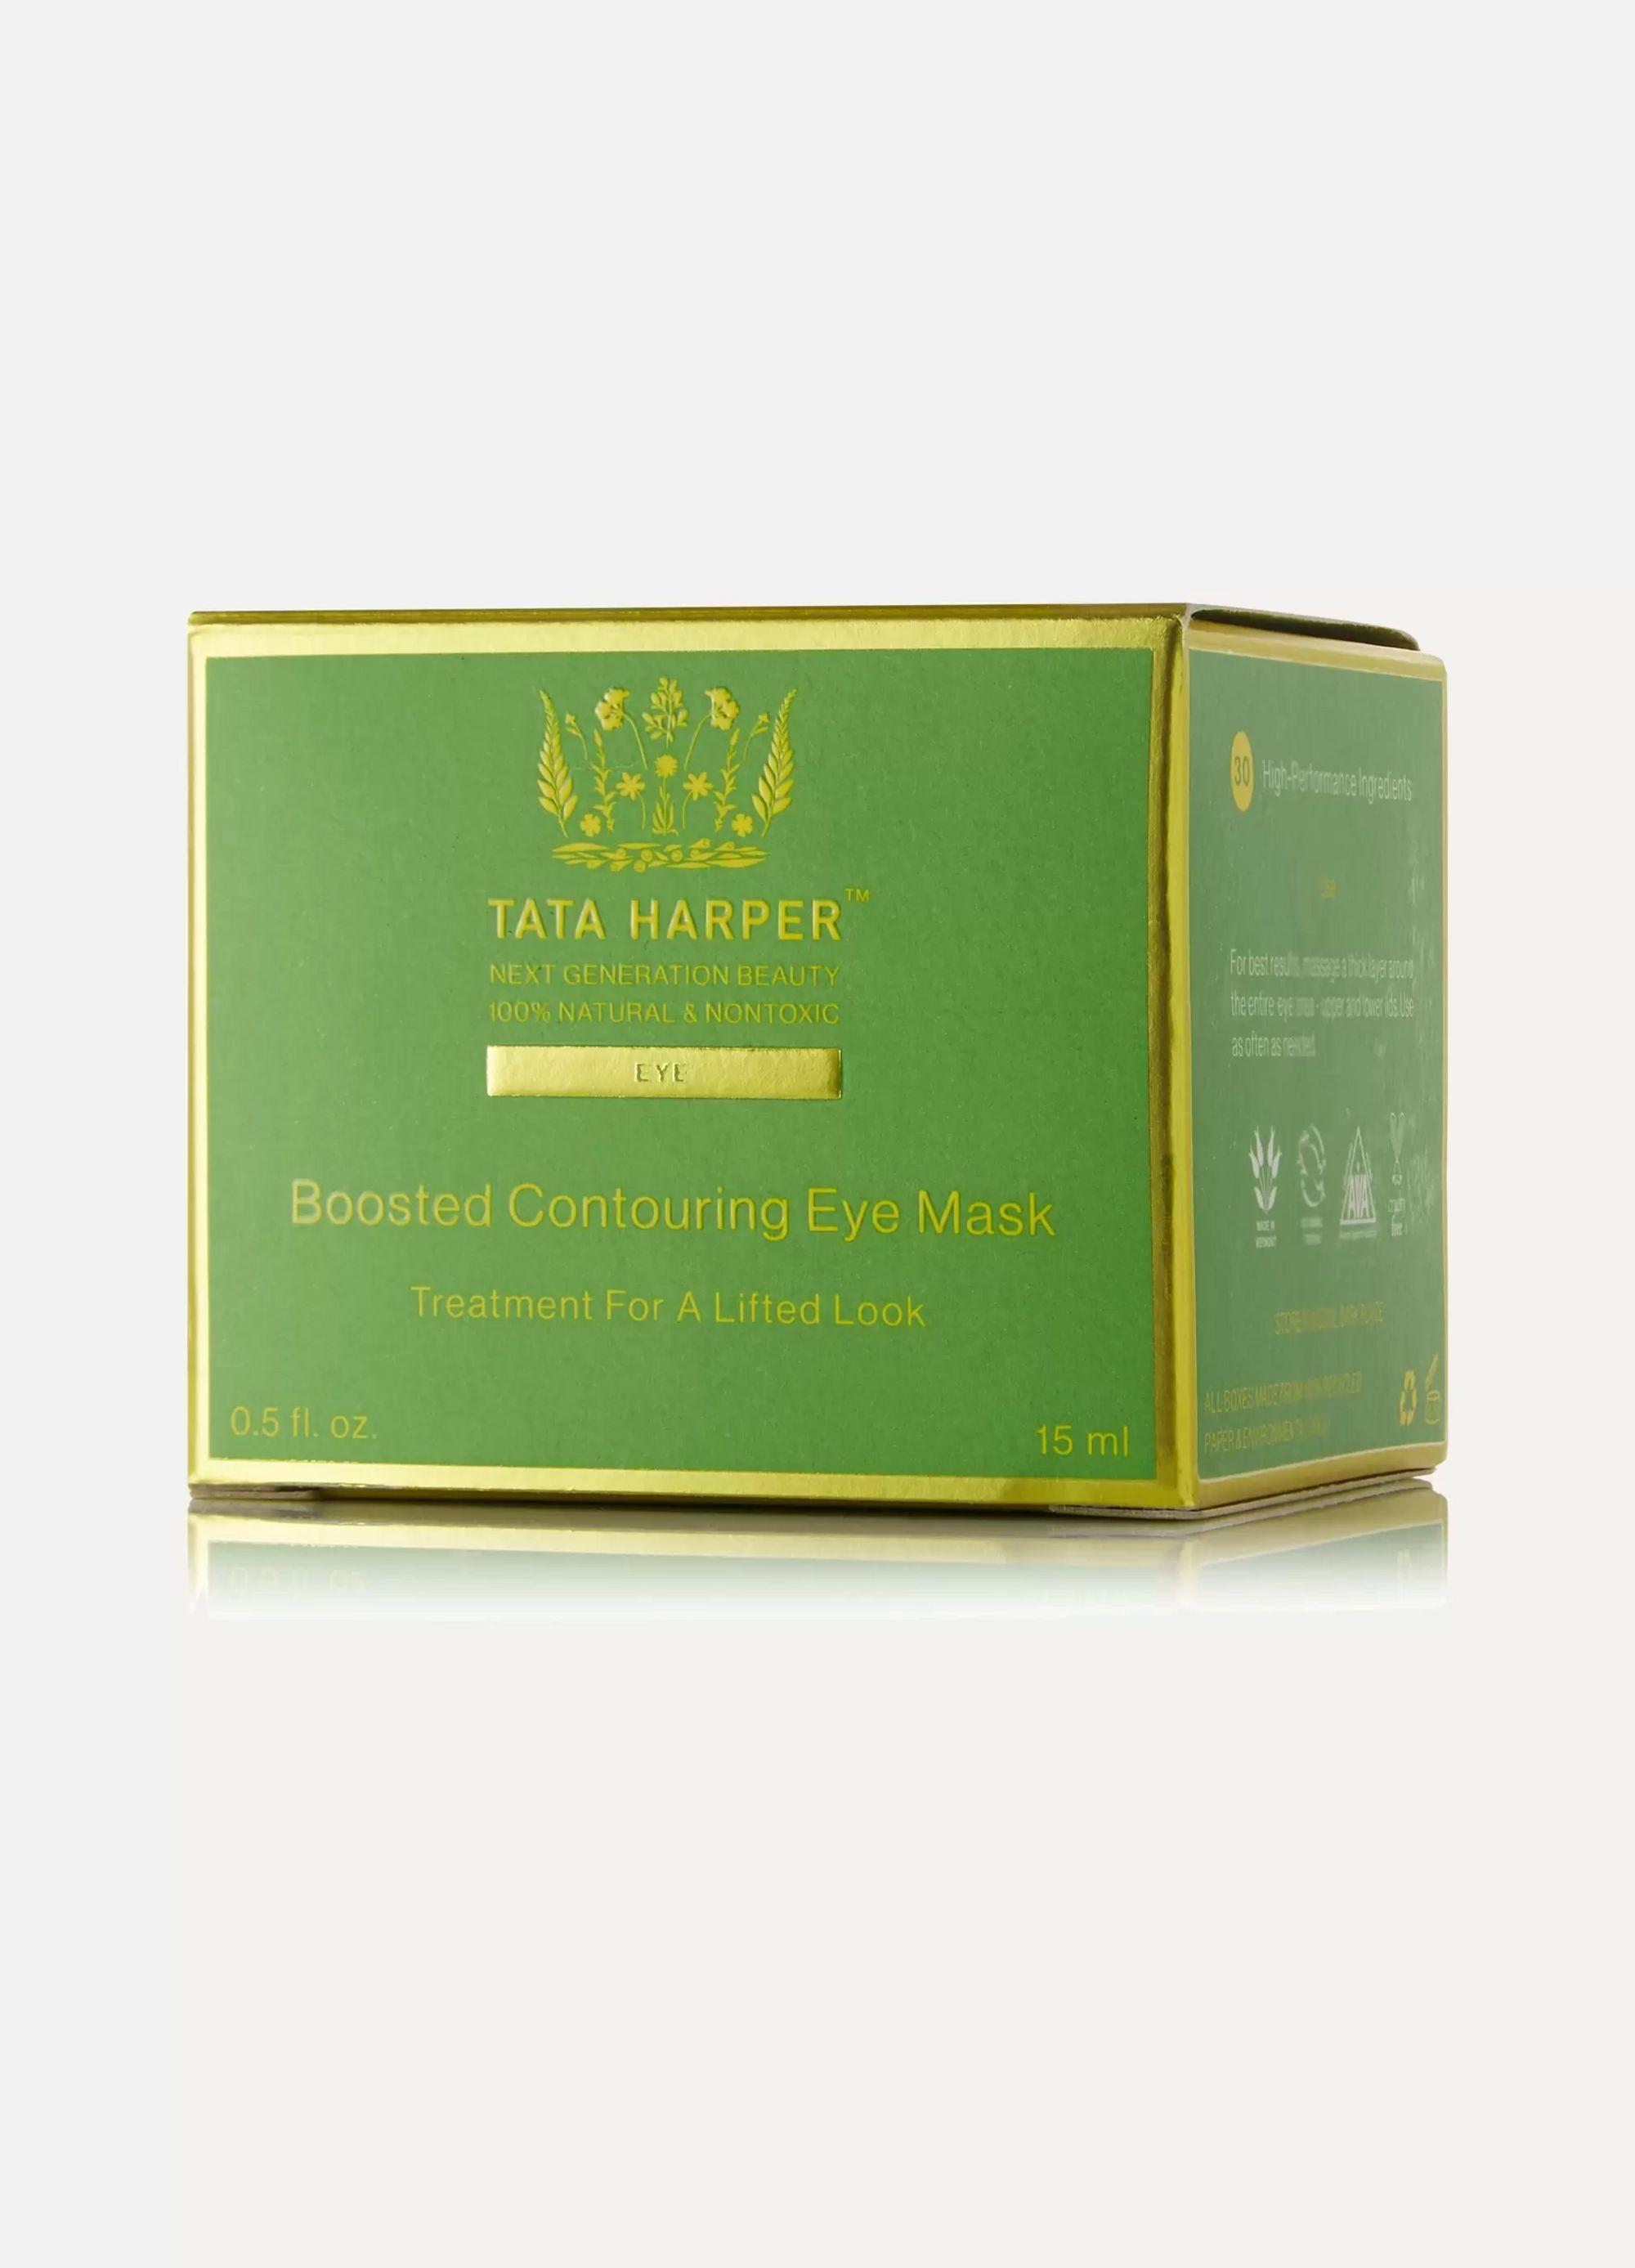 Tata Harper Boosted Contouring Eye Mask, 15ml